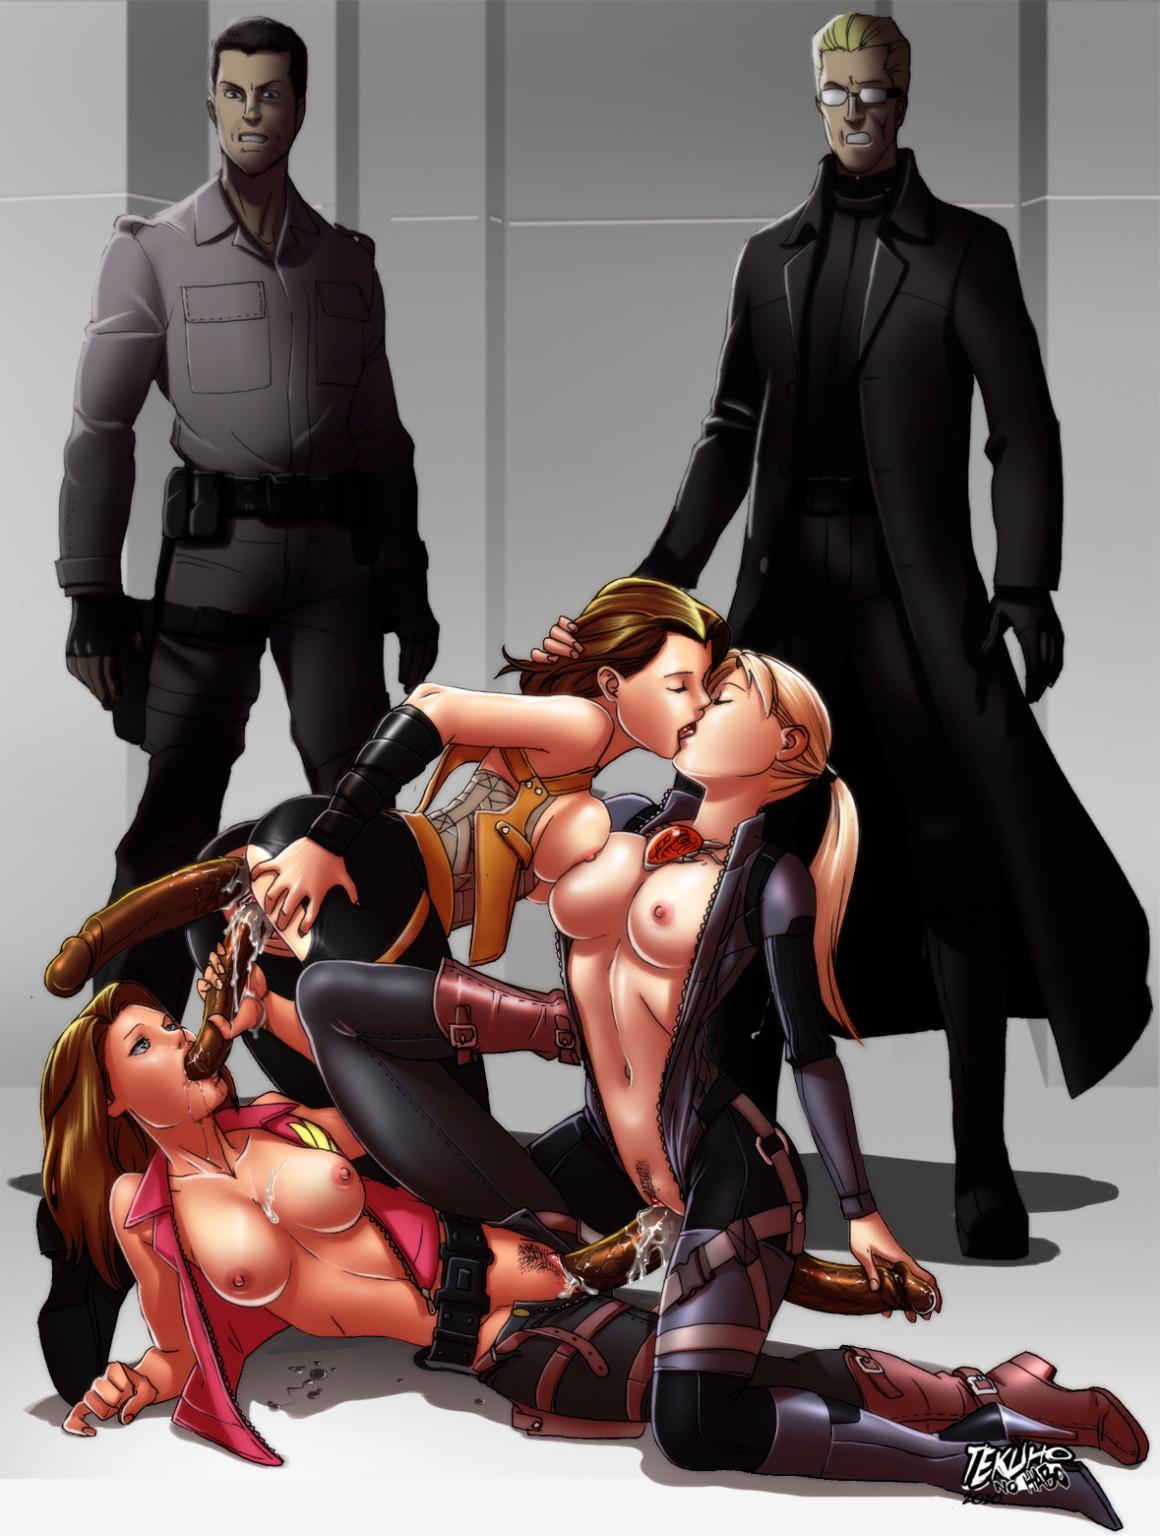 Werner recommend best of futanari sex anime hot